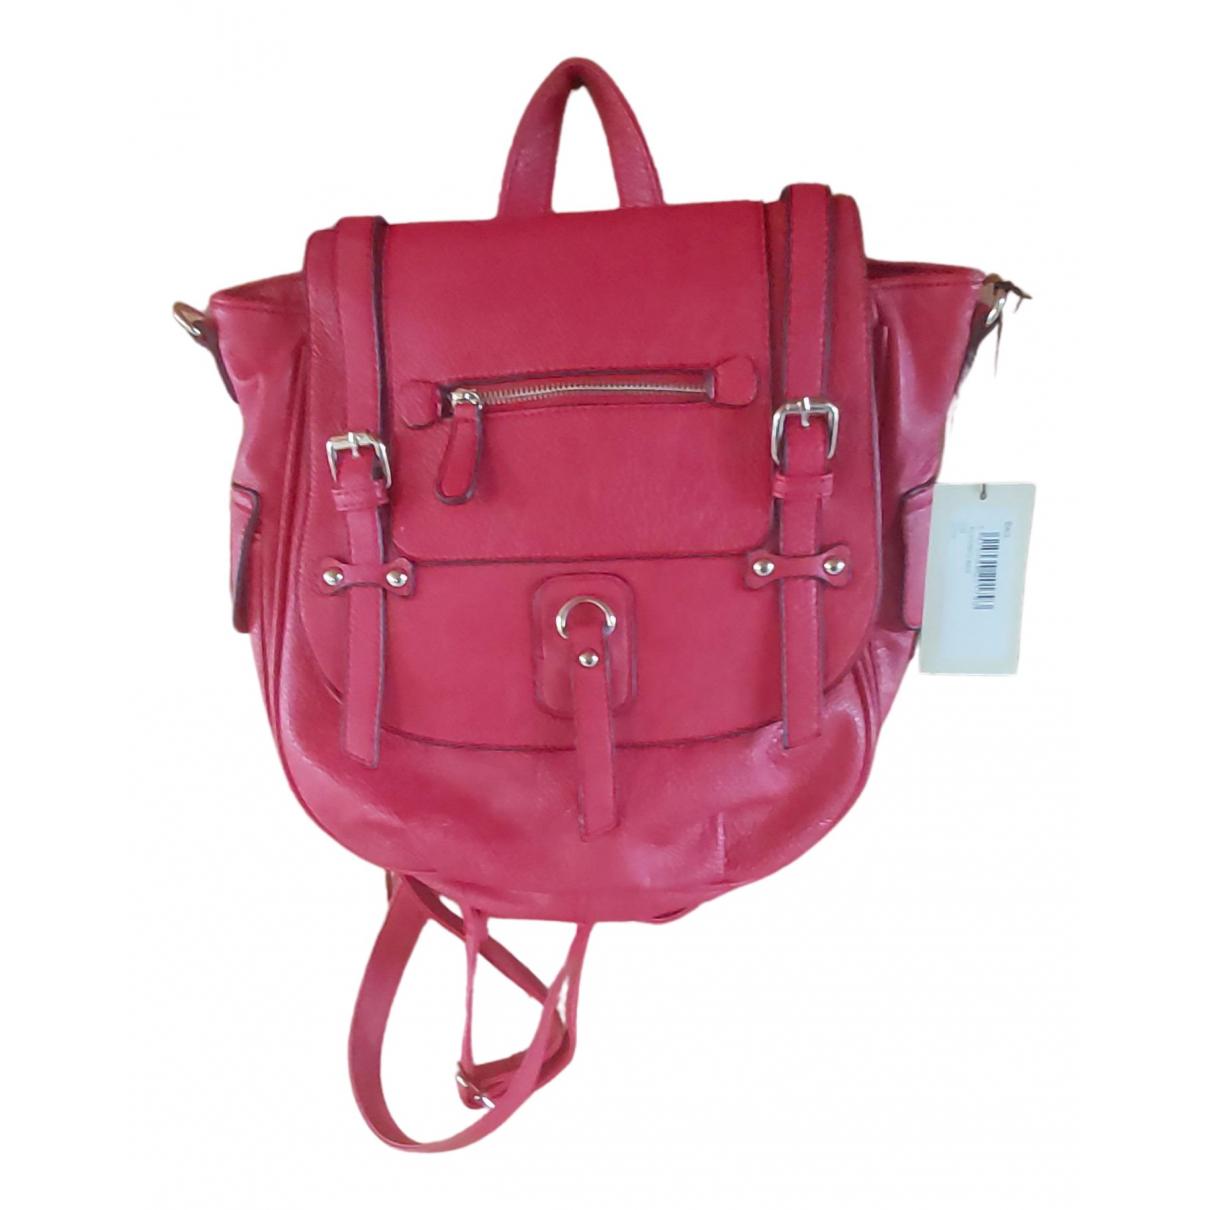 Essentiel Antwerp \N Handtasche in  Rot Leder